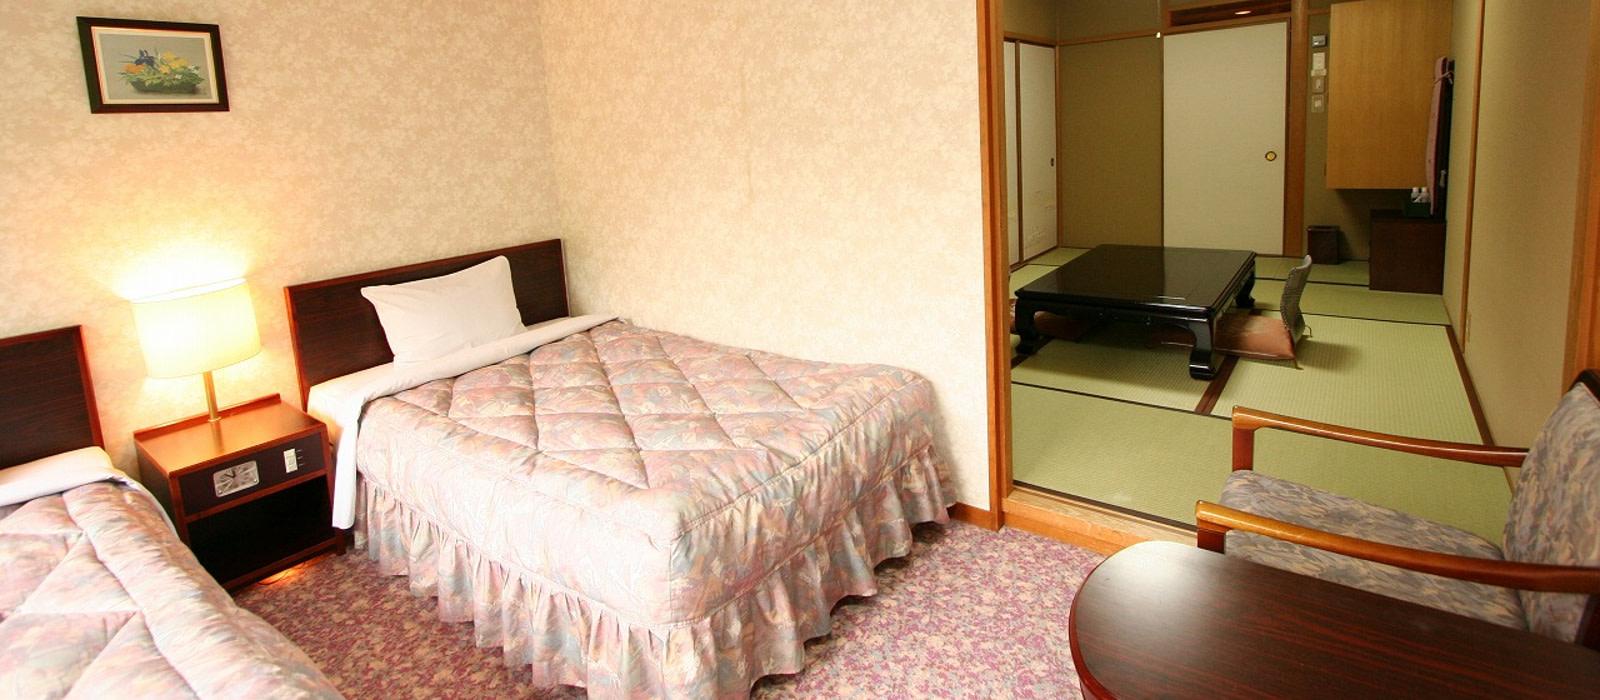 Hotel Hoshokaku Takayama Ryokan Japan